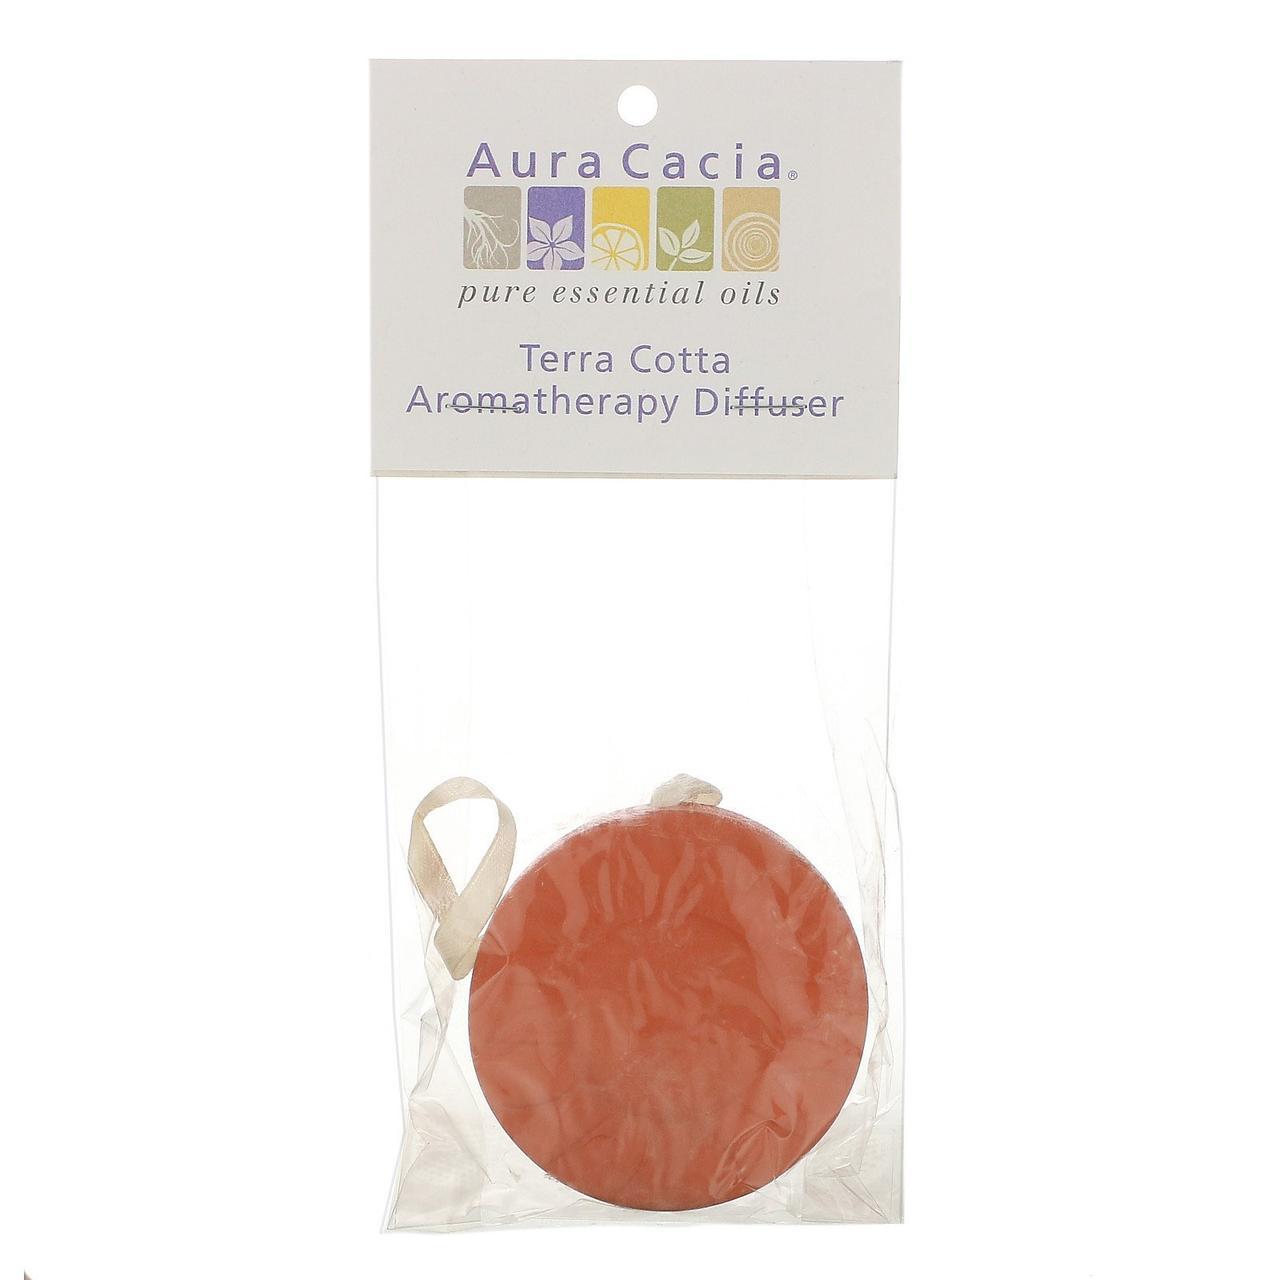 Ароматерапевтический диффузор, солнце (Terra Cotta Aromatherapy Diffuser), Aura Cacia